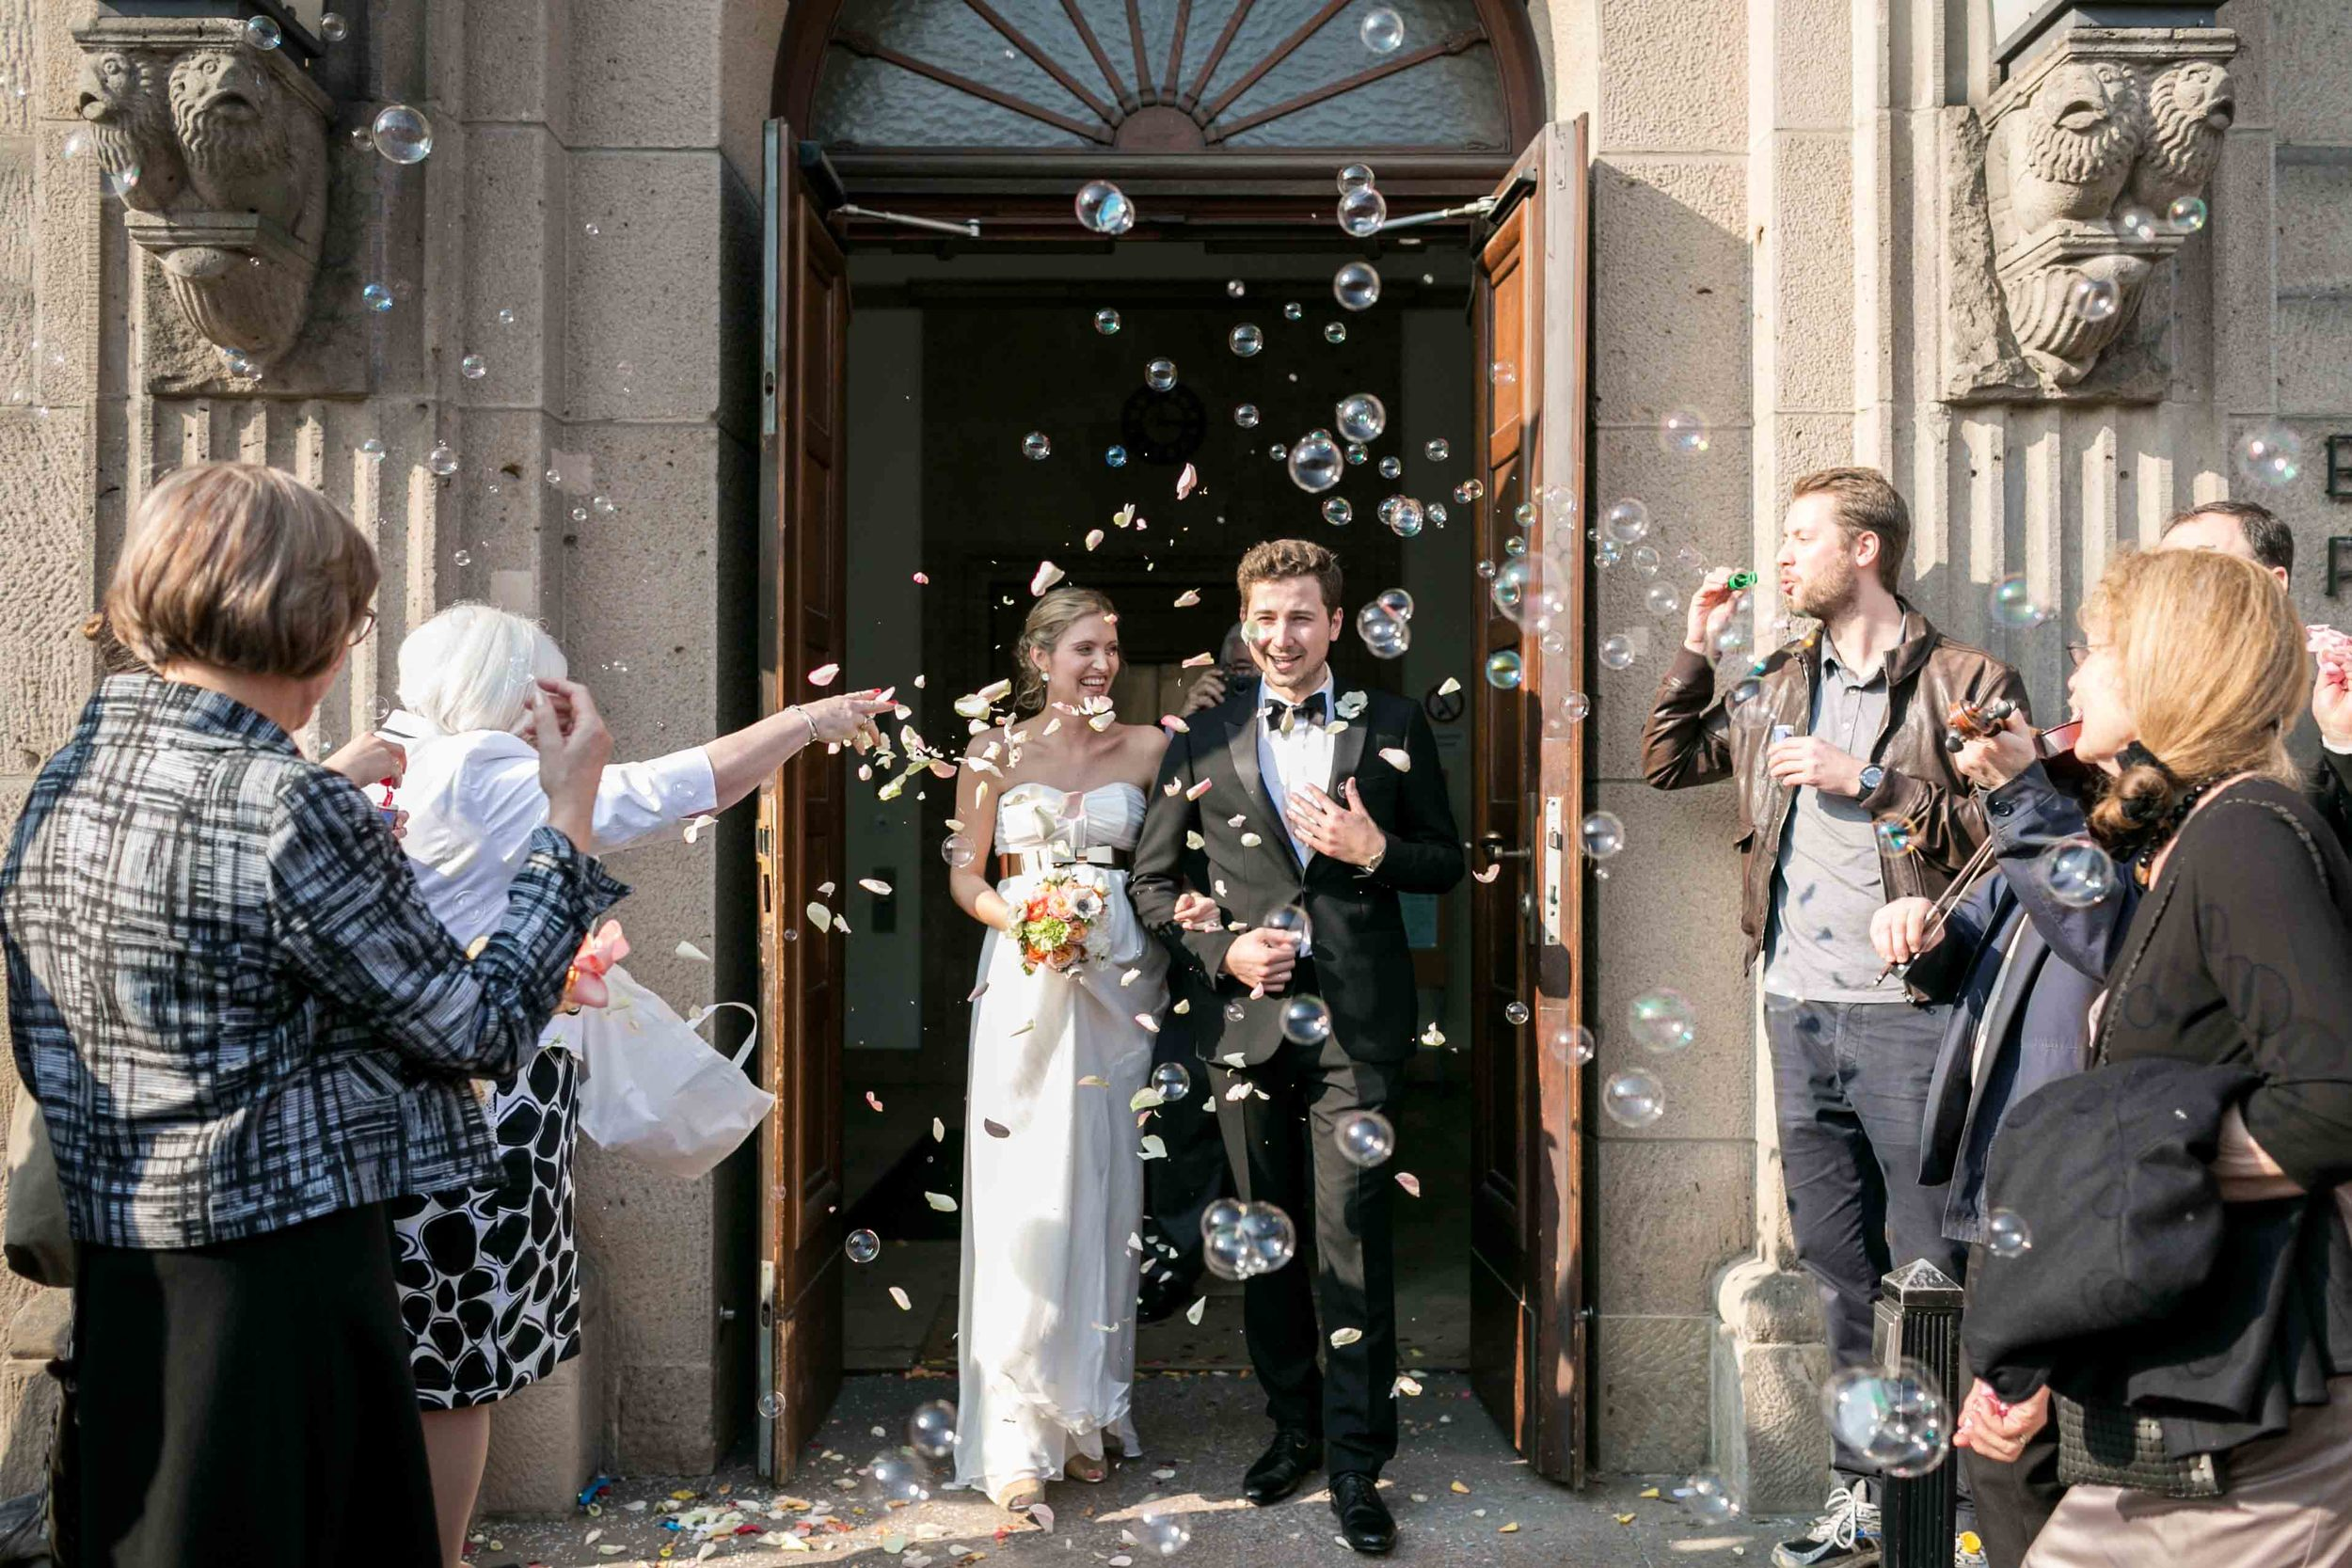 Berlin Hochzeitsfotografie_Fran Burrows Fotografie-64.jpg